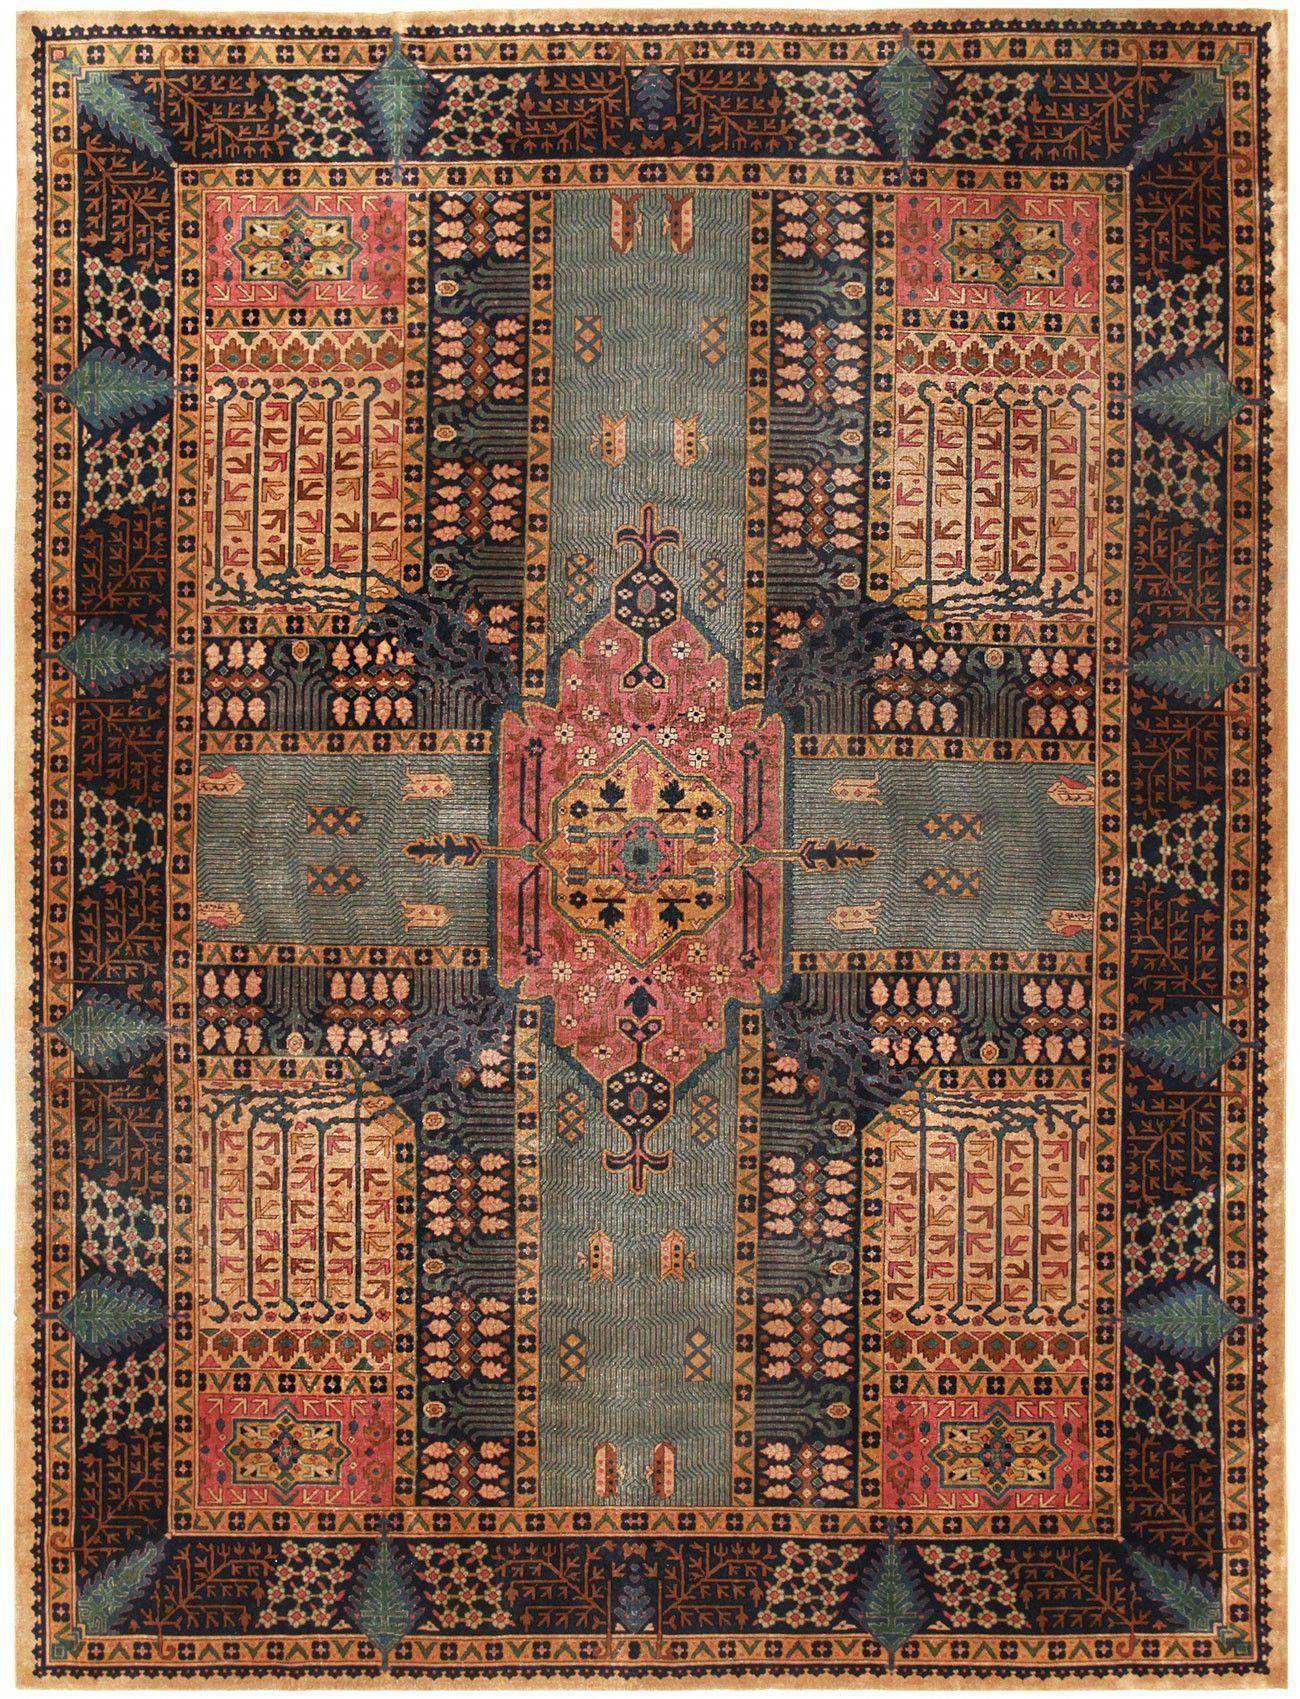 Carpet Runners Northern Ireland Carpetrunnerslosangeles In 2020 Indian Carpet Textured Carpet Patterned Carpet